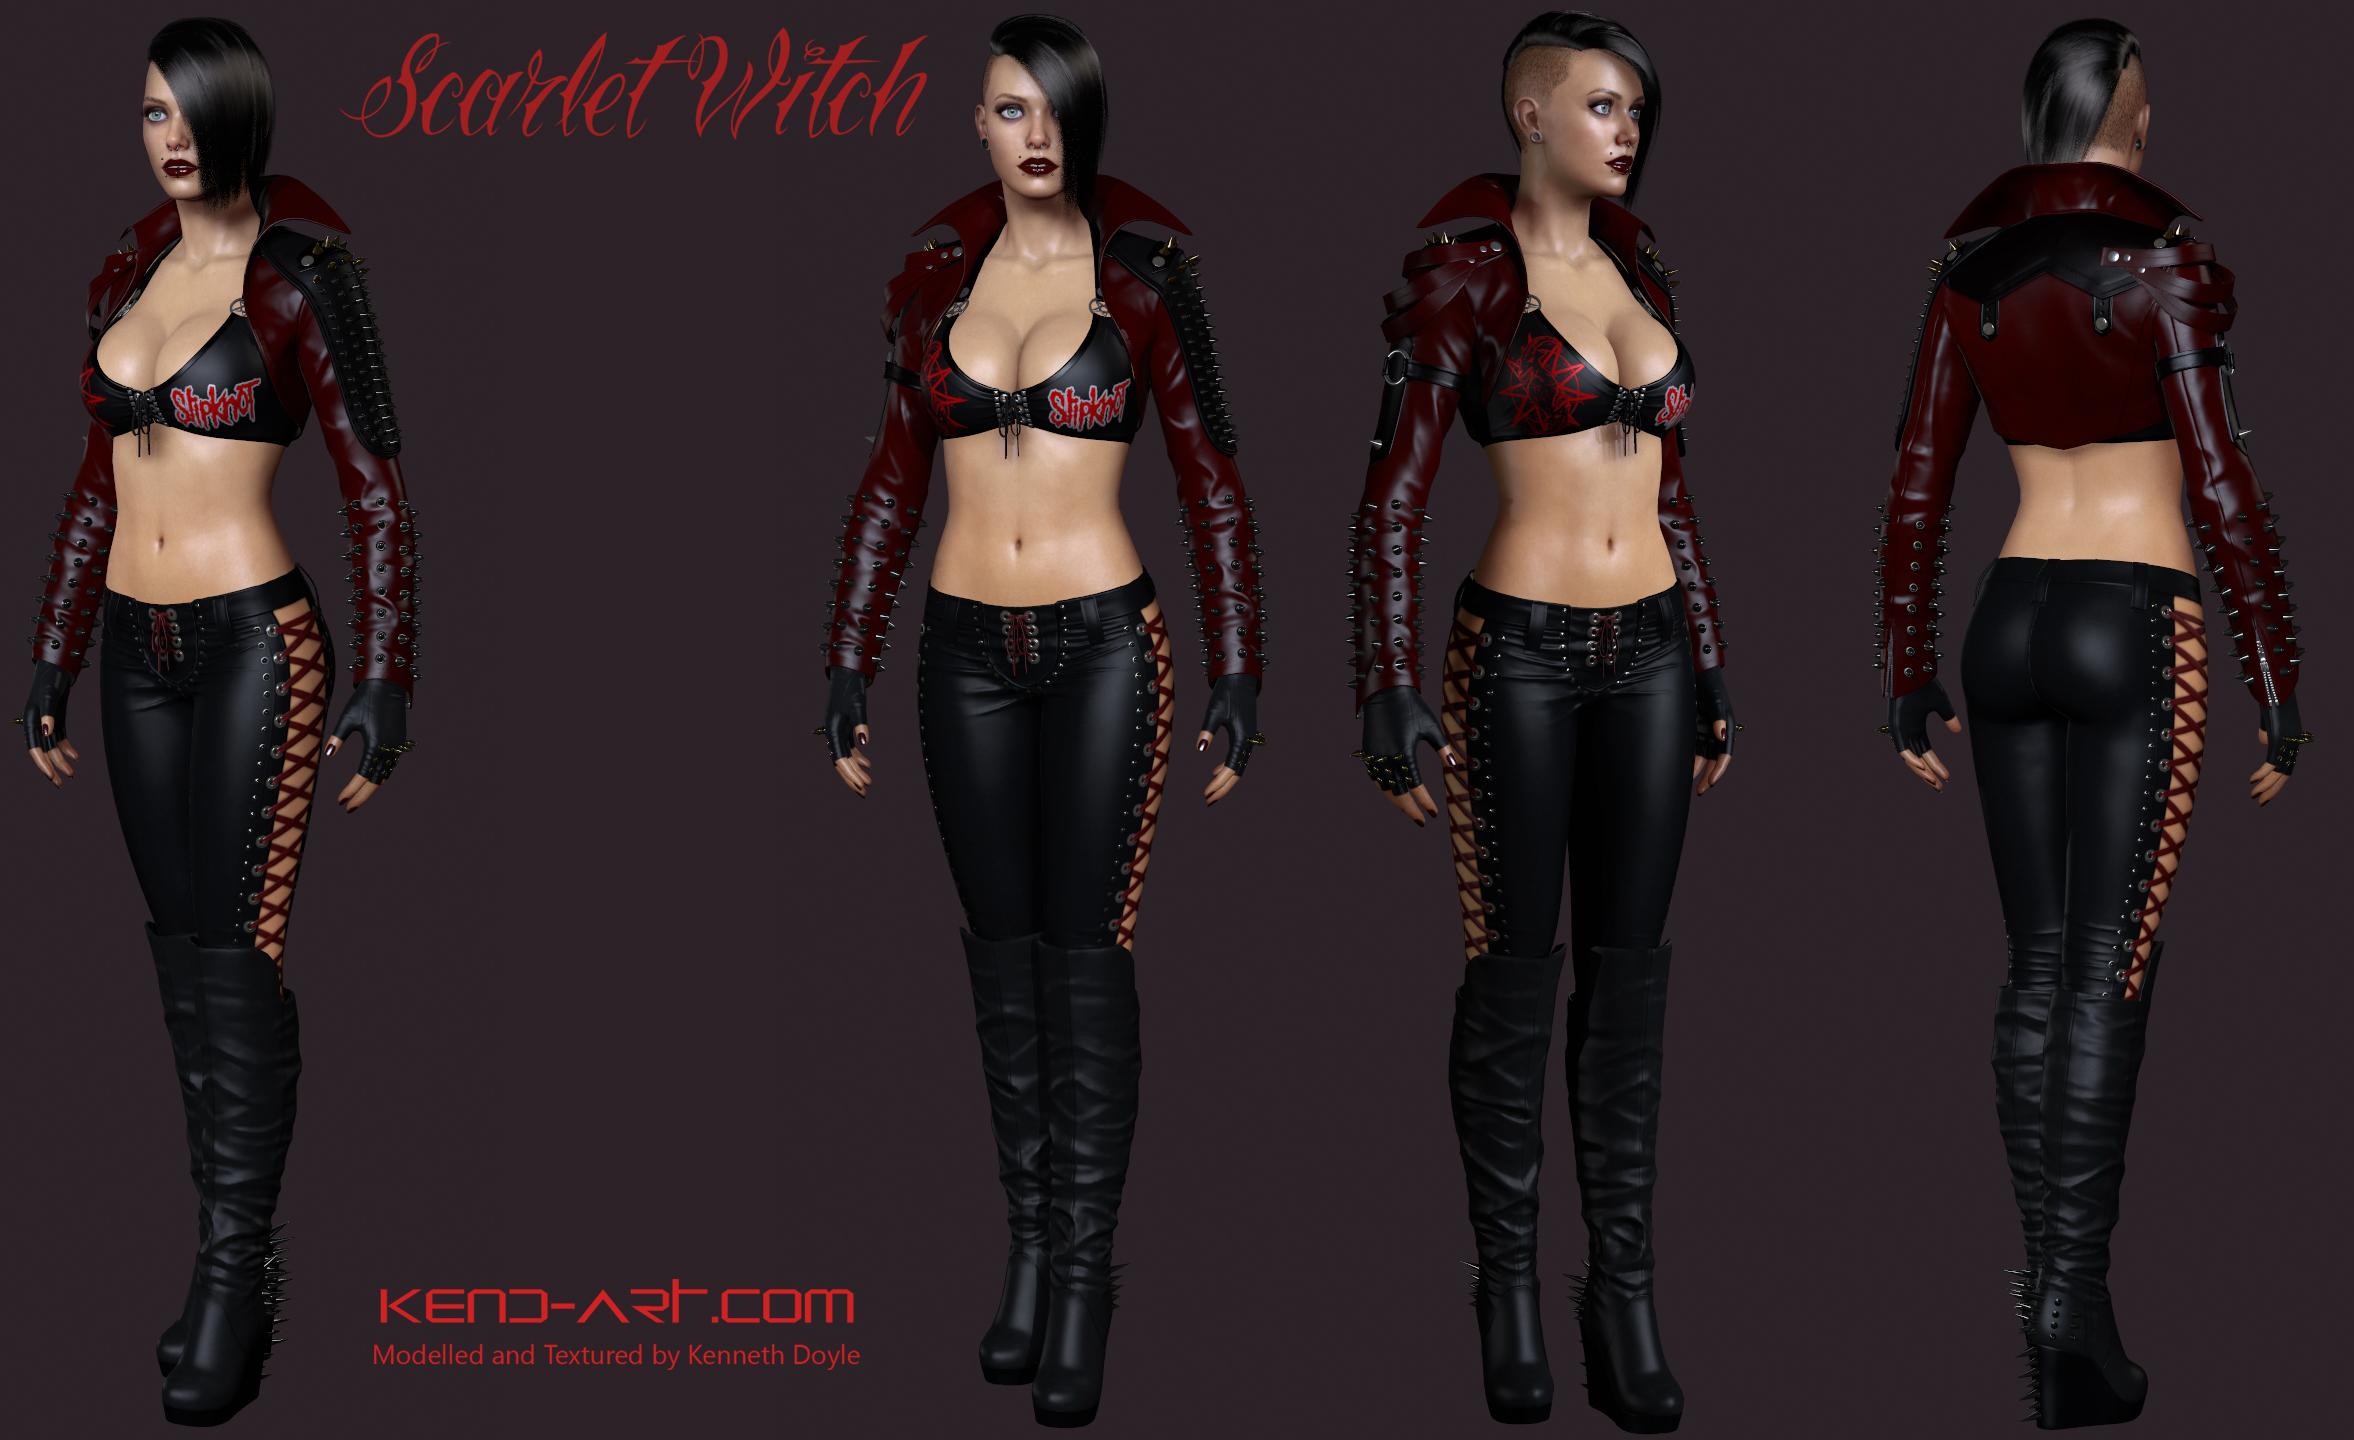 scarlet_witch_full_body_by_kdoyle9-d953ax0.jpg